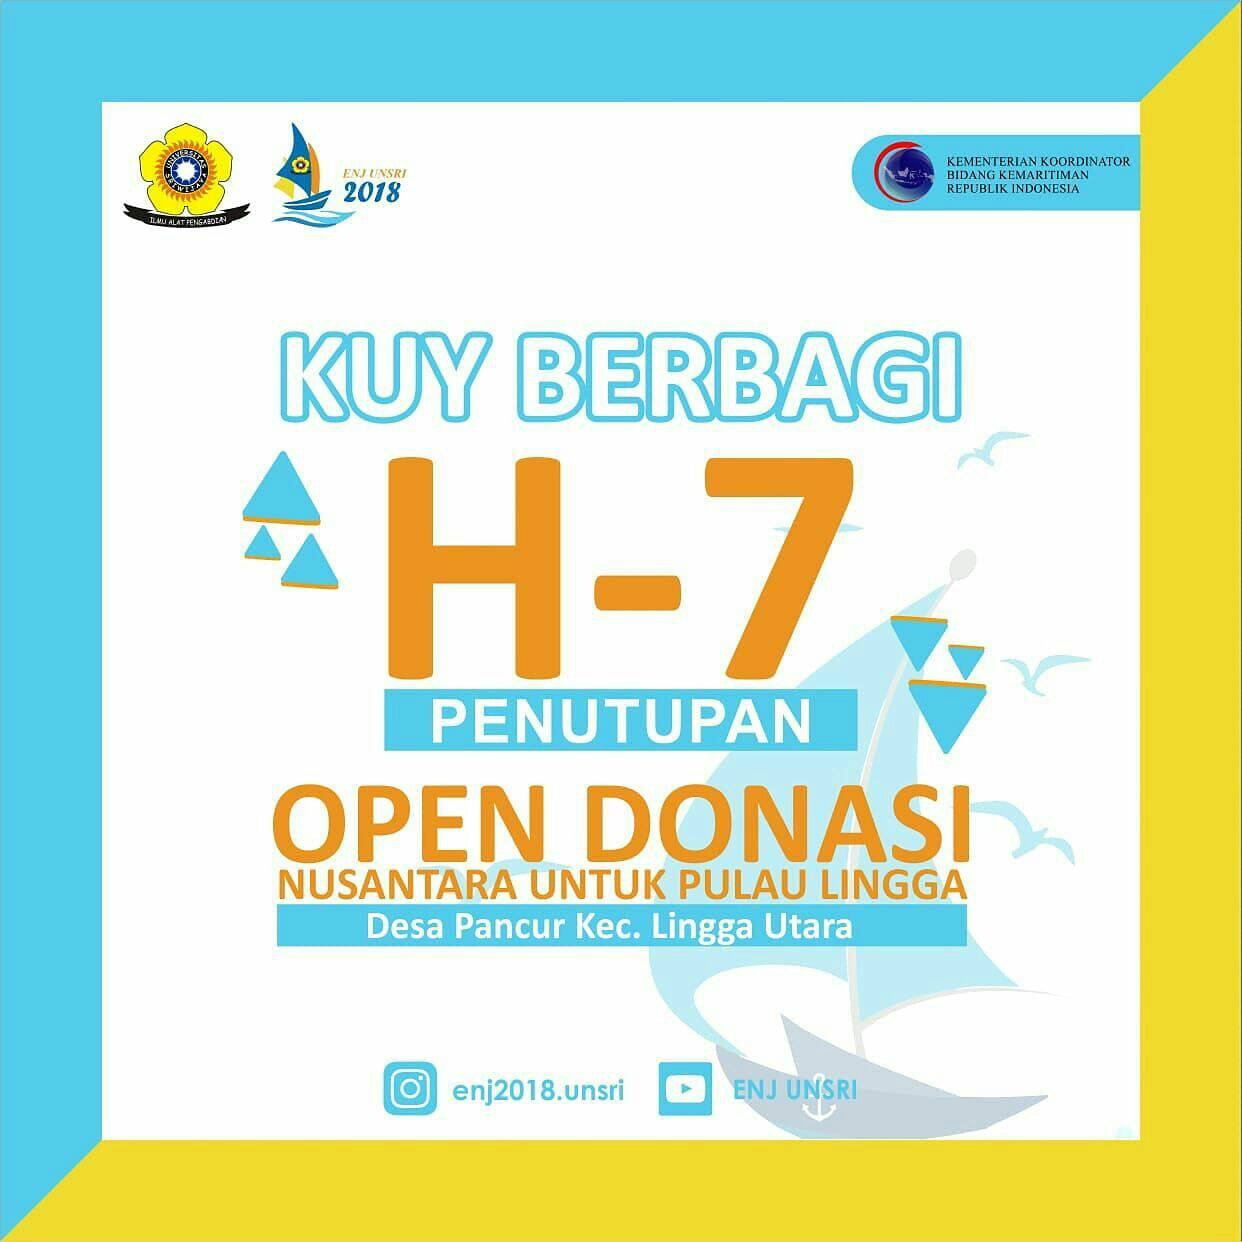 Info Donasi Ekspedisi Nusantara Jaya Unsri 2018 ke Pulau Lingga, Kepri